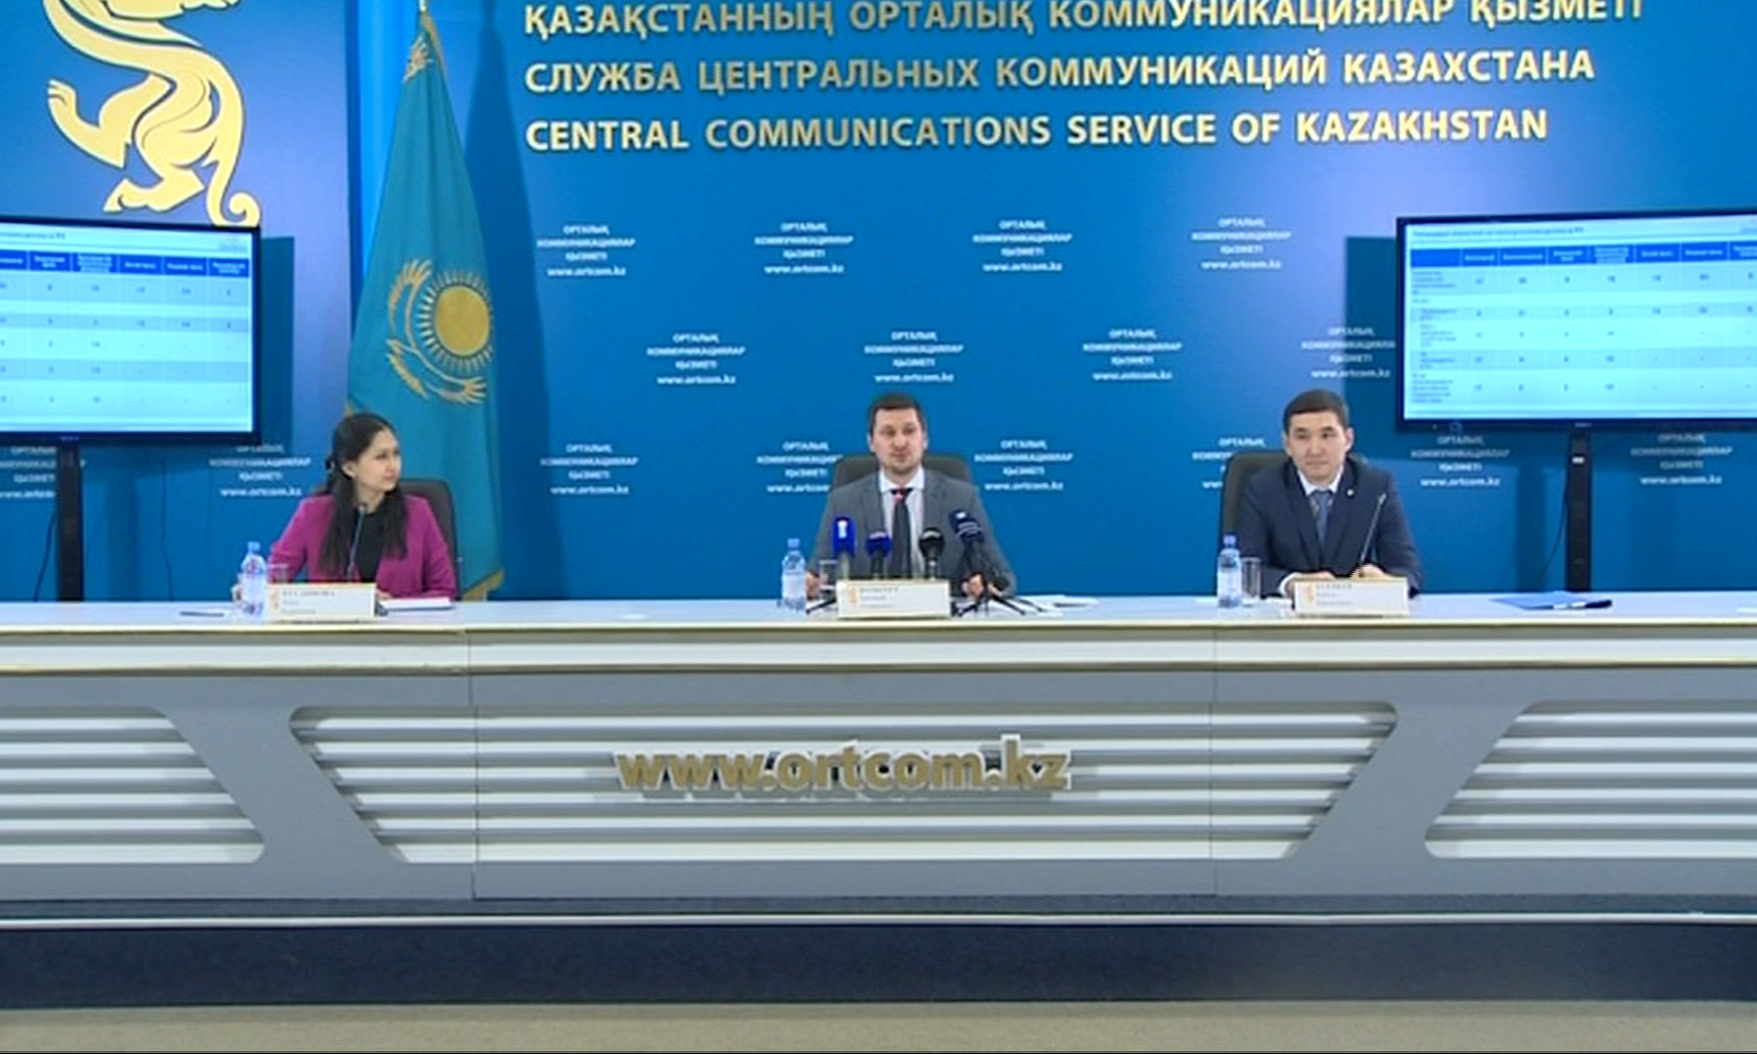 Последние периферии казахстана